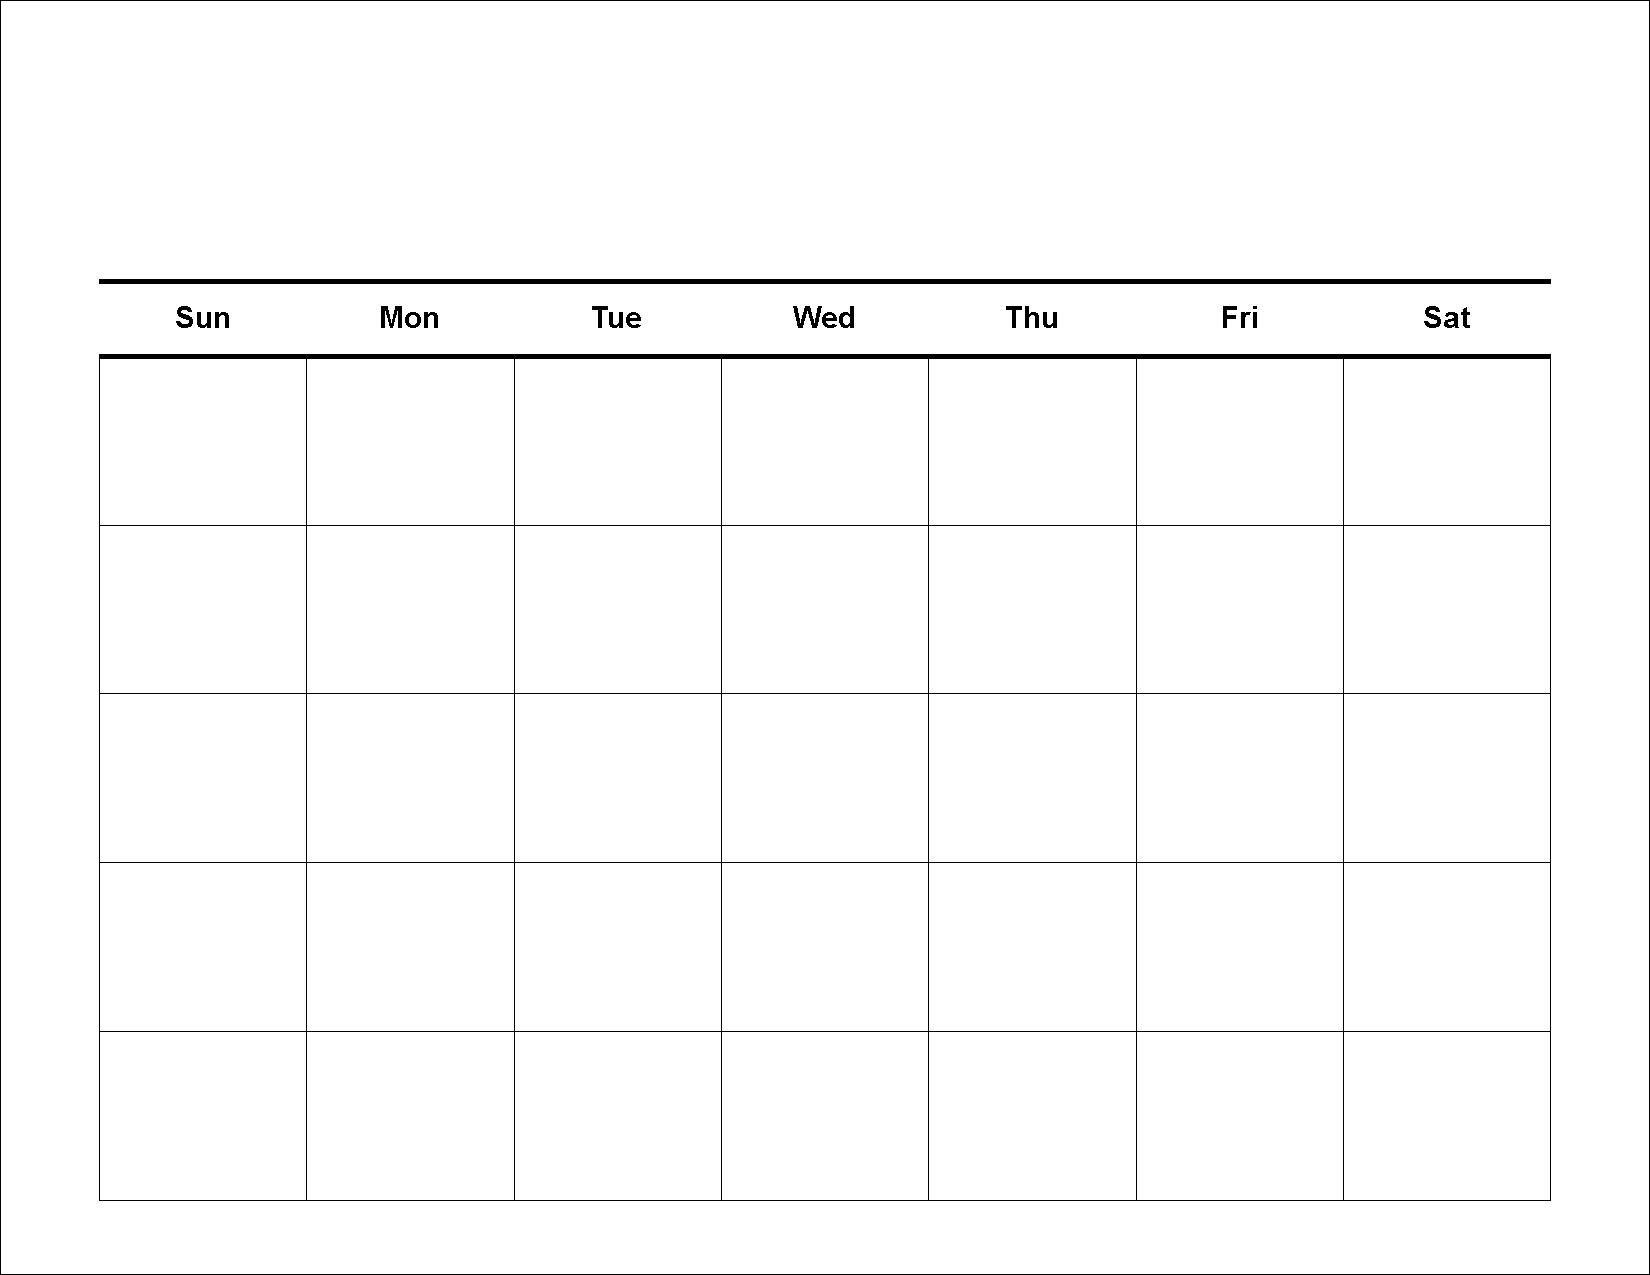 Free 5 Day Calendar Template | Printable Calendar Templates 2019 regarding 5 Day Calendar Printable Free